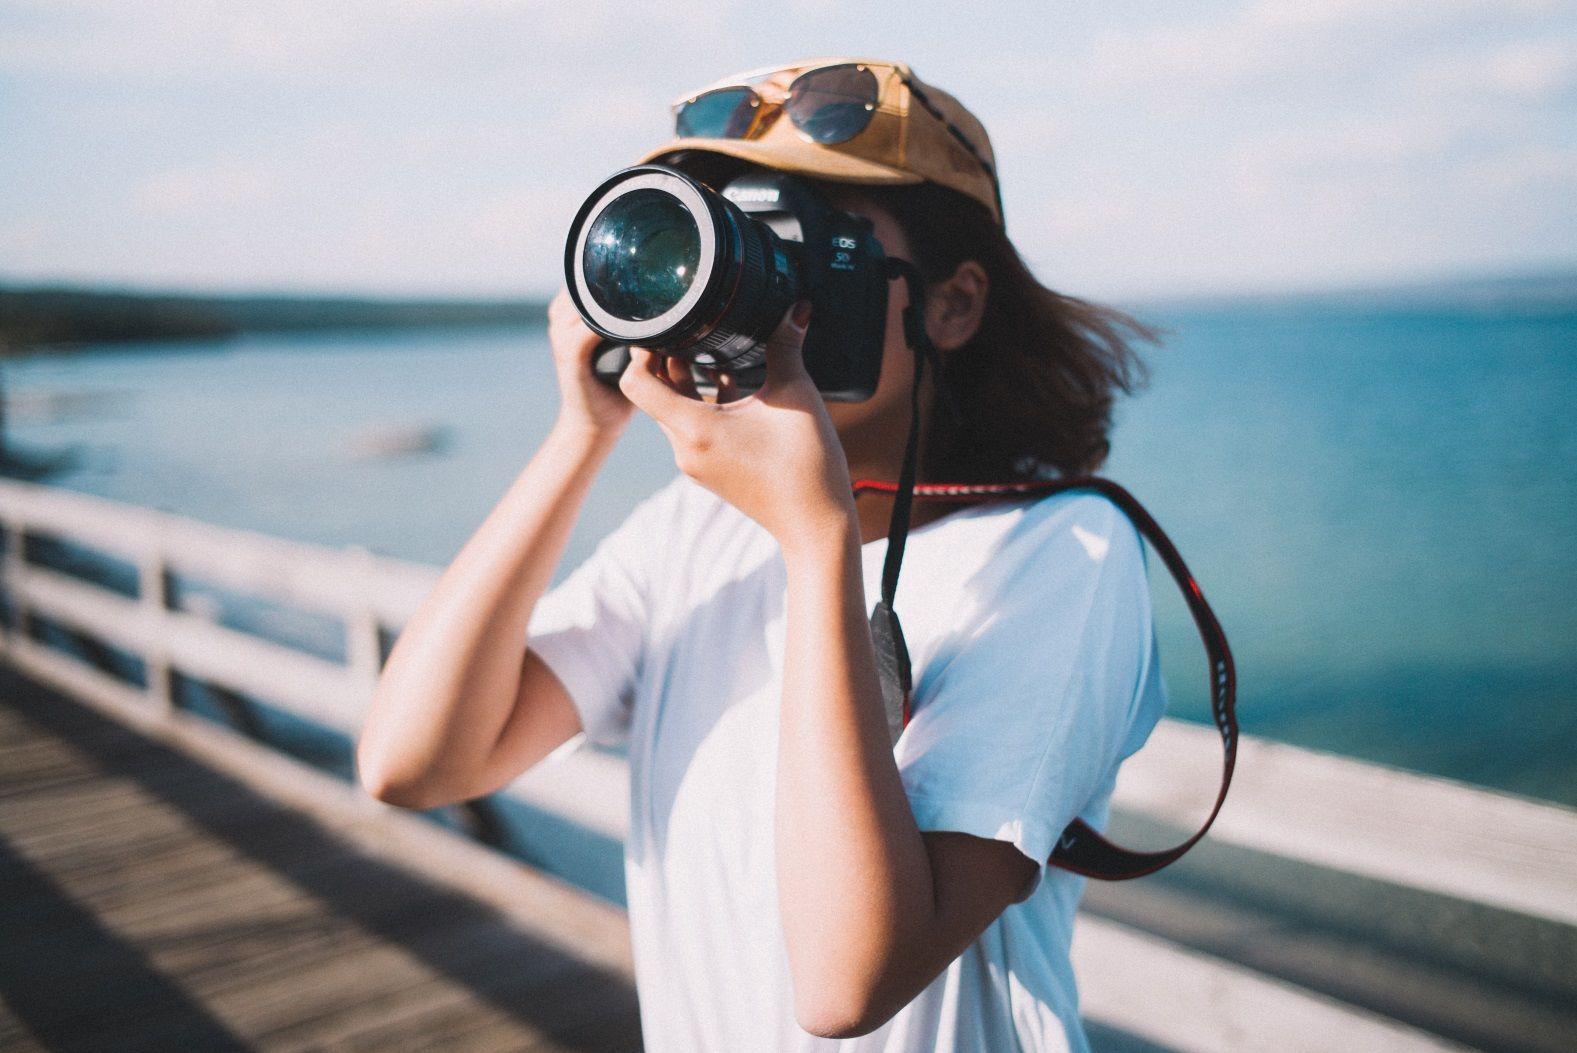 турист фотограф камера